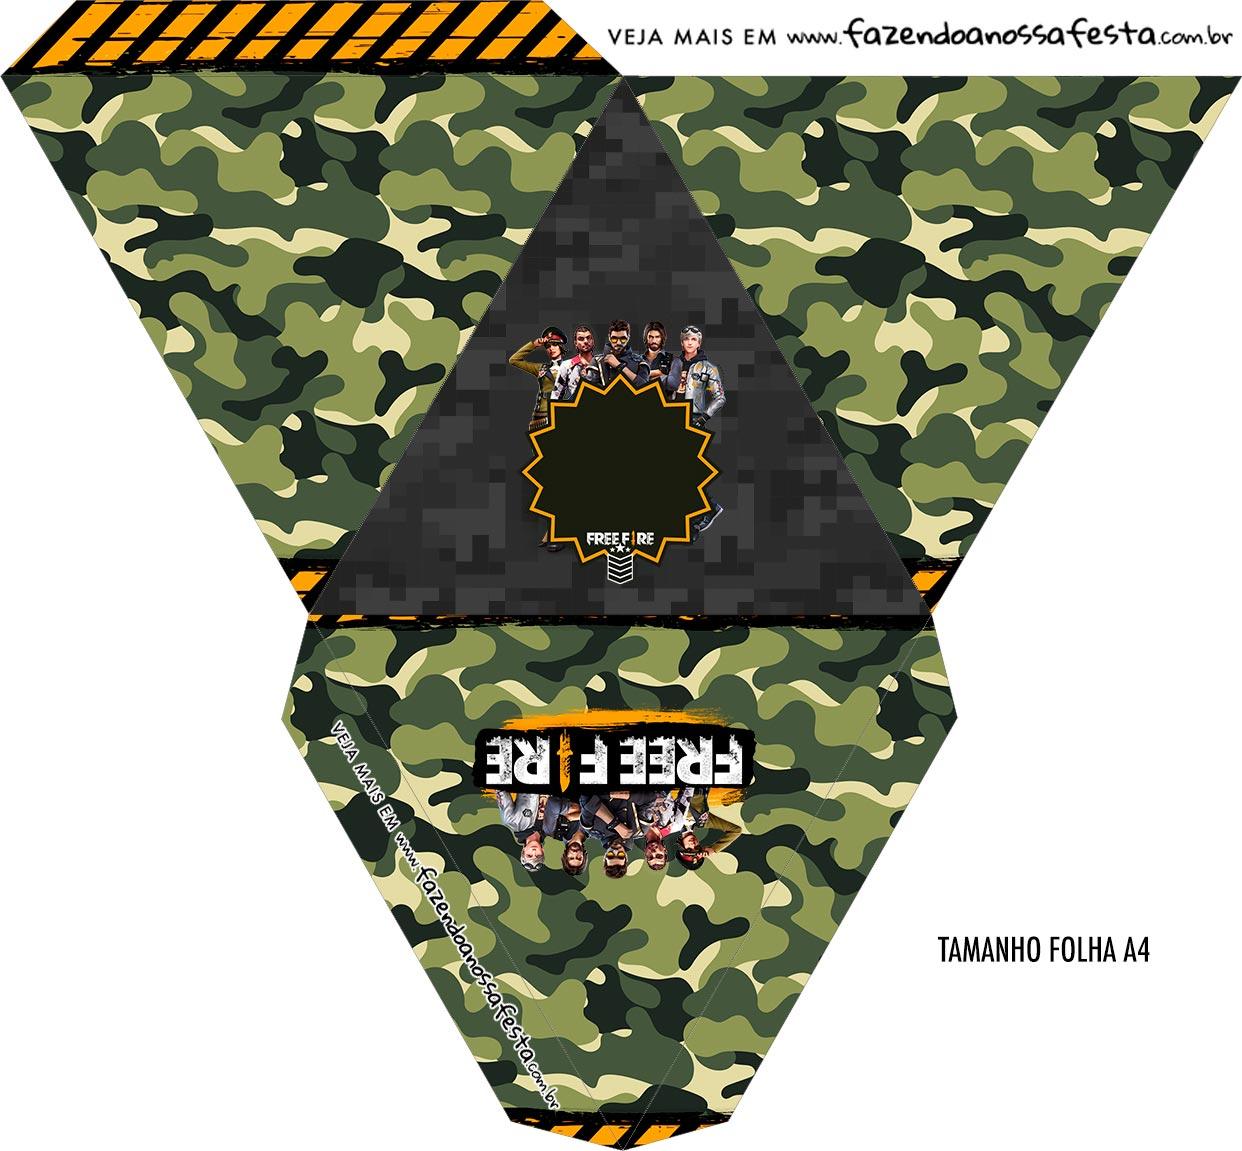 Caixa Piramide Personalizada Free Fire